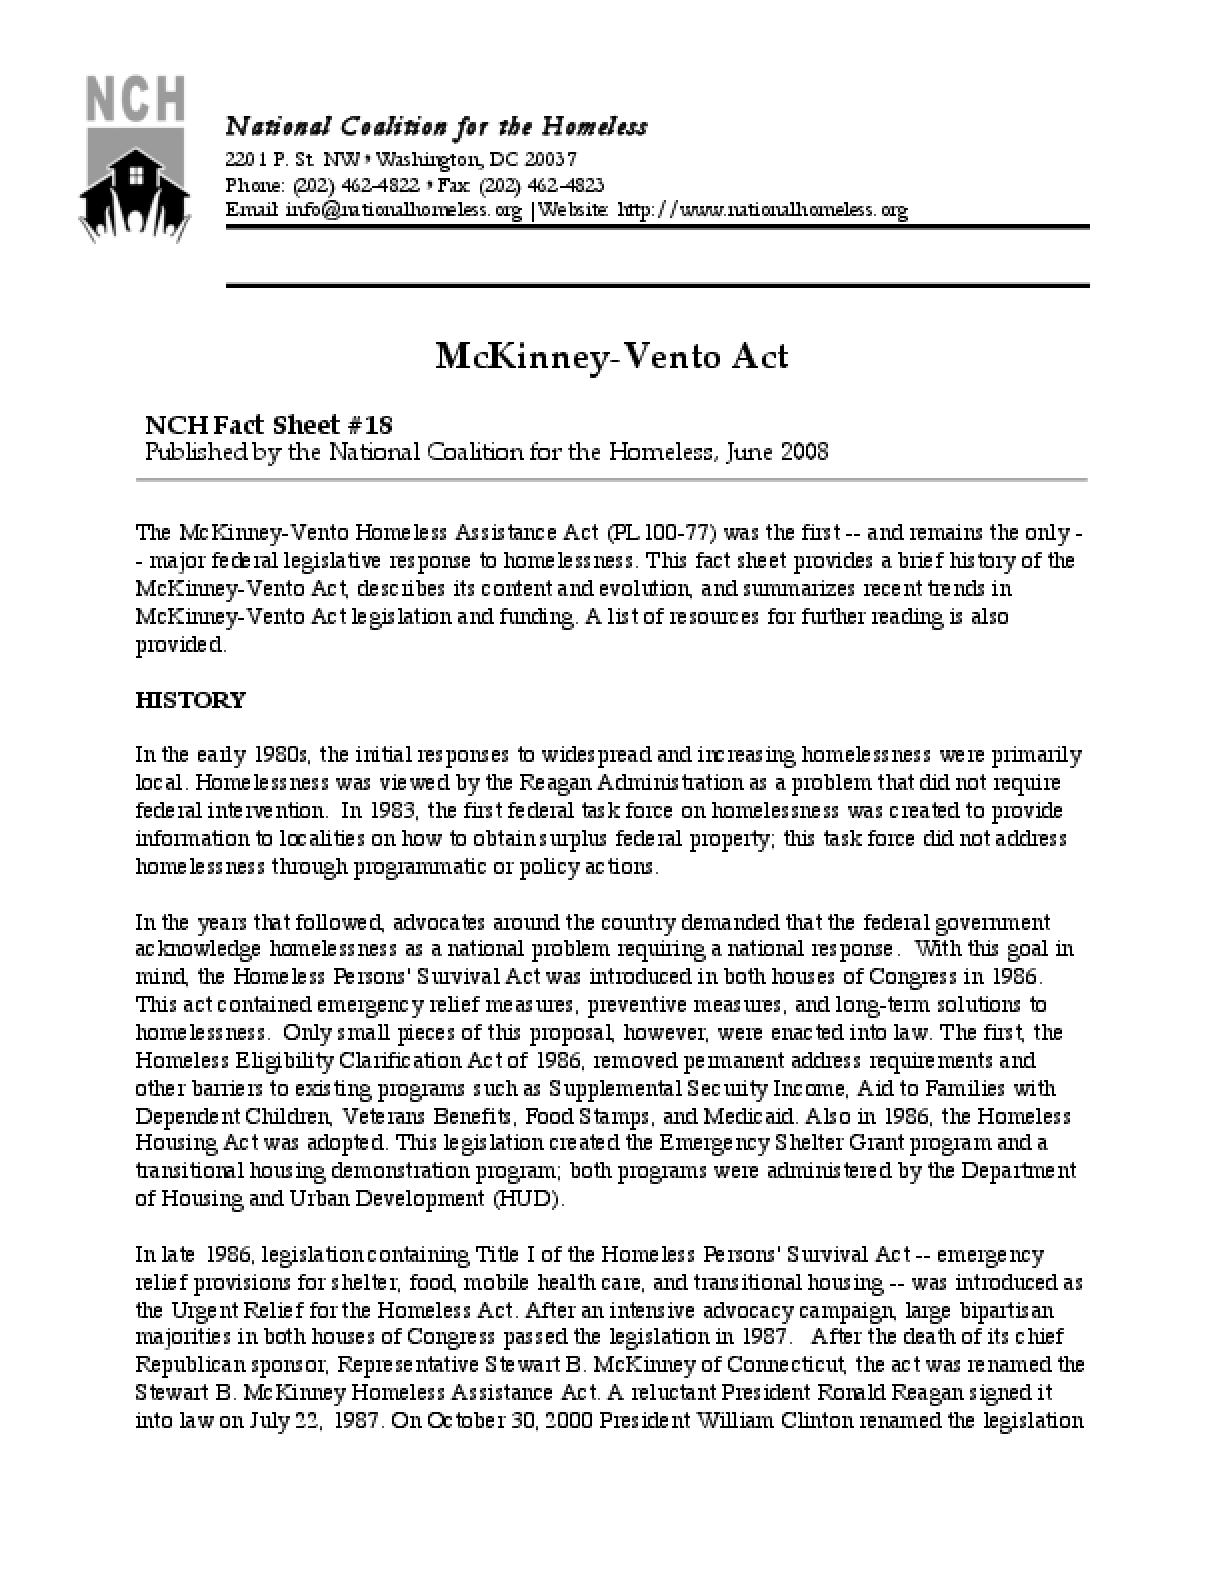 The Mckinney-Vento Act Factsheet